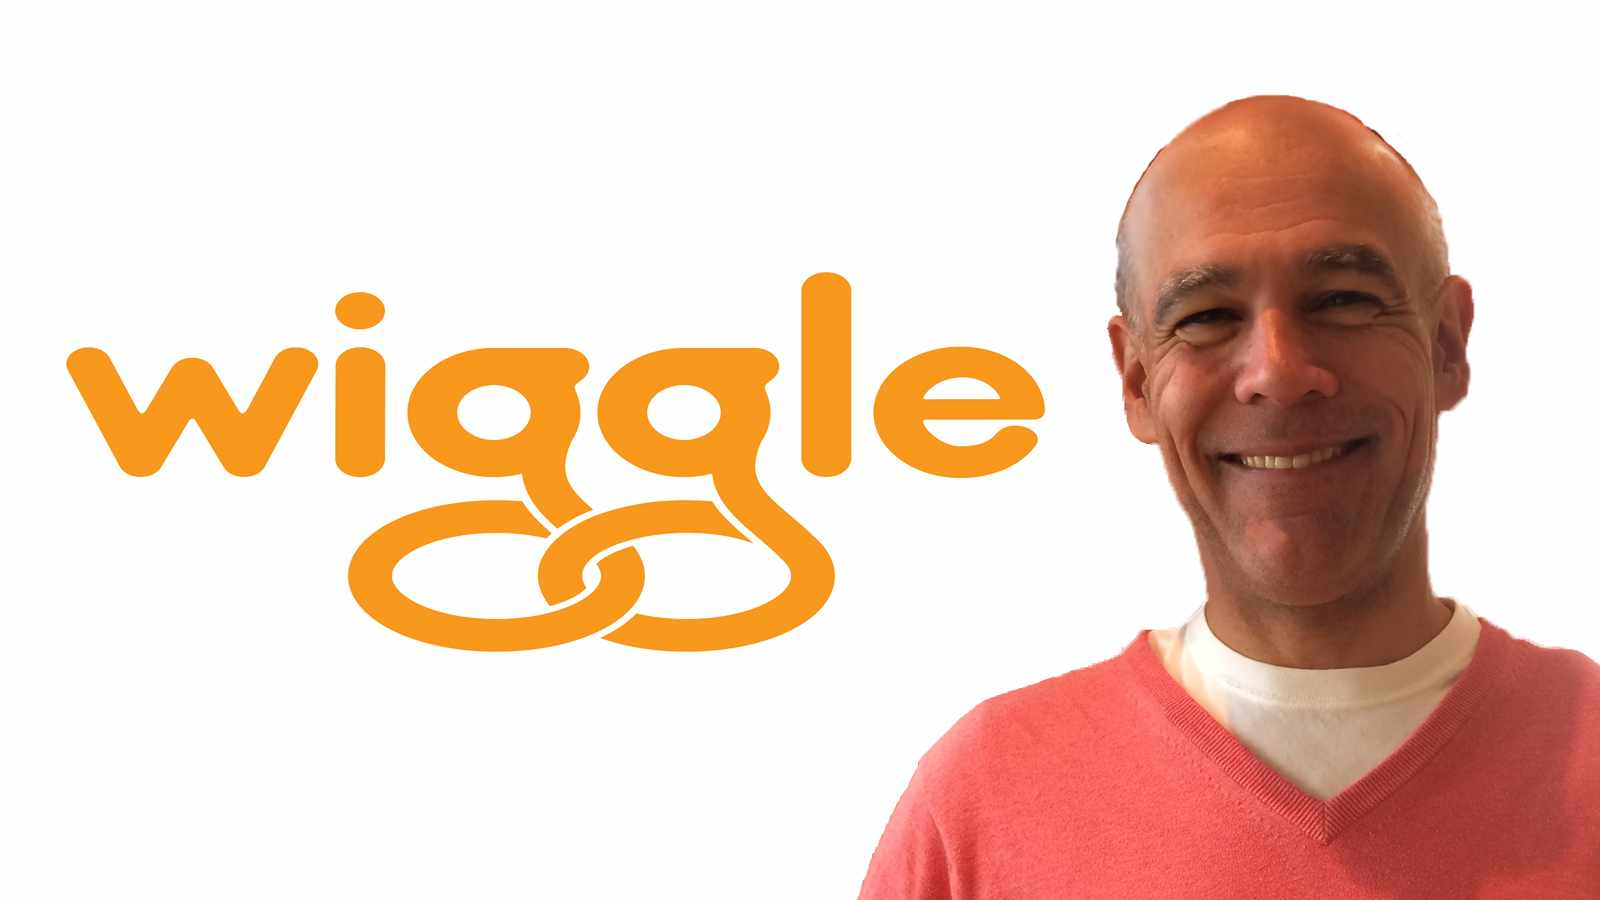 Adam Johnson of Wiggle Australia